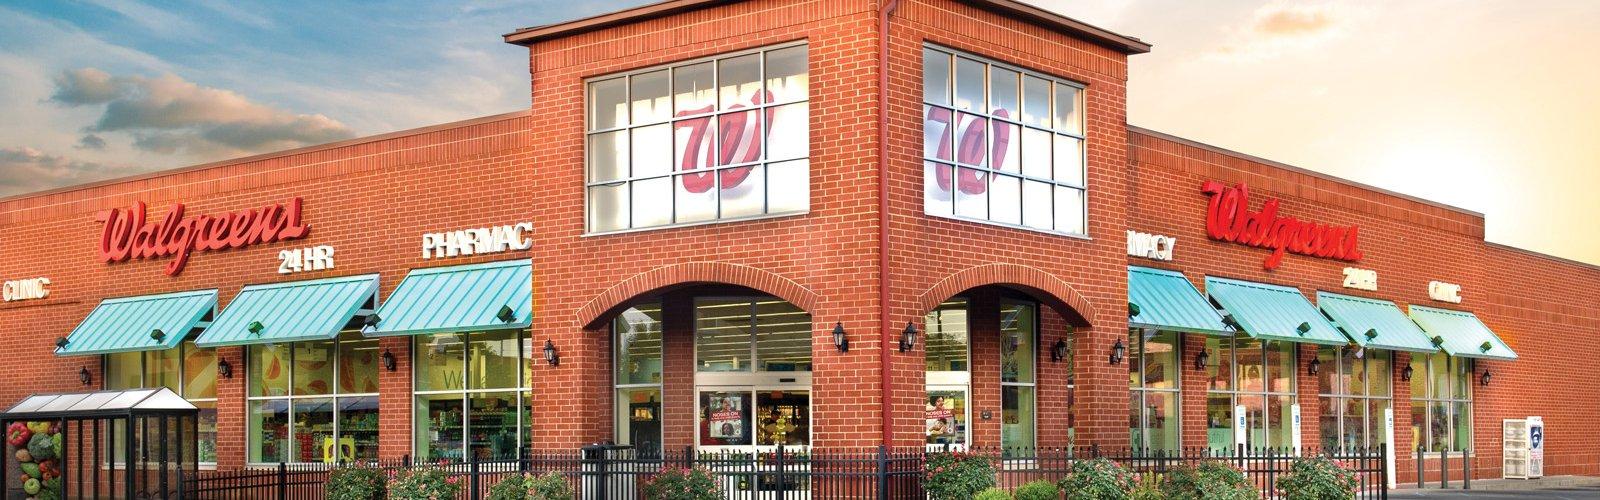 Community Clinic at Walgreens - Indianapolis 10th Street | Community